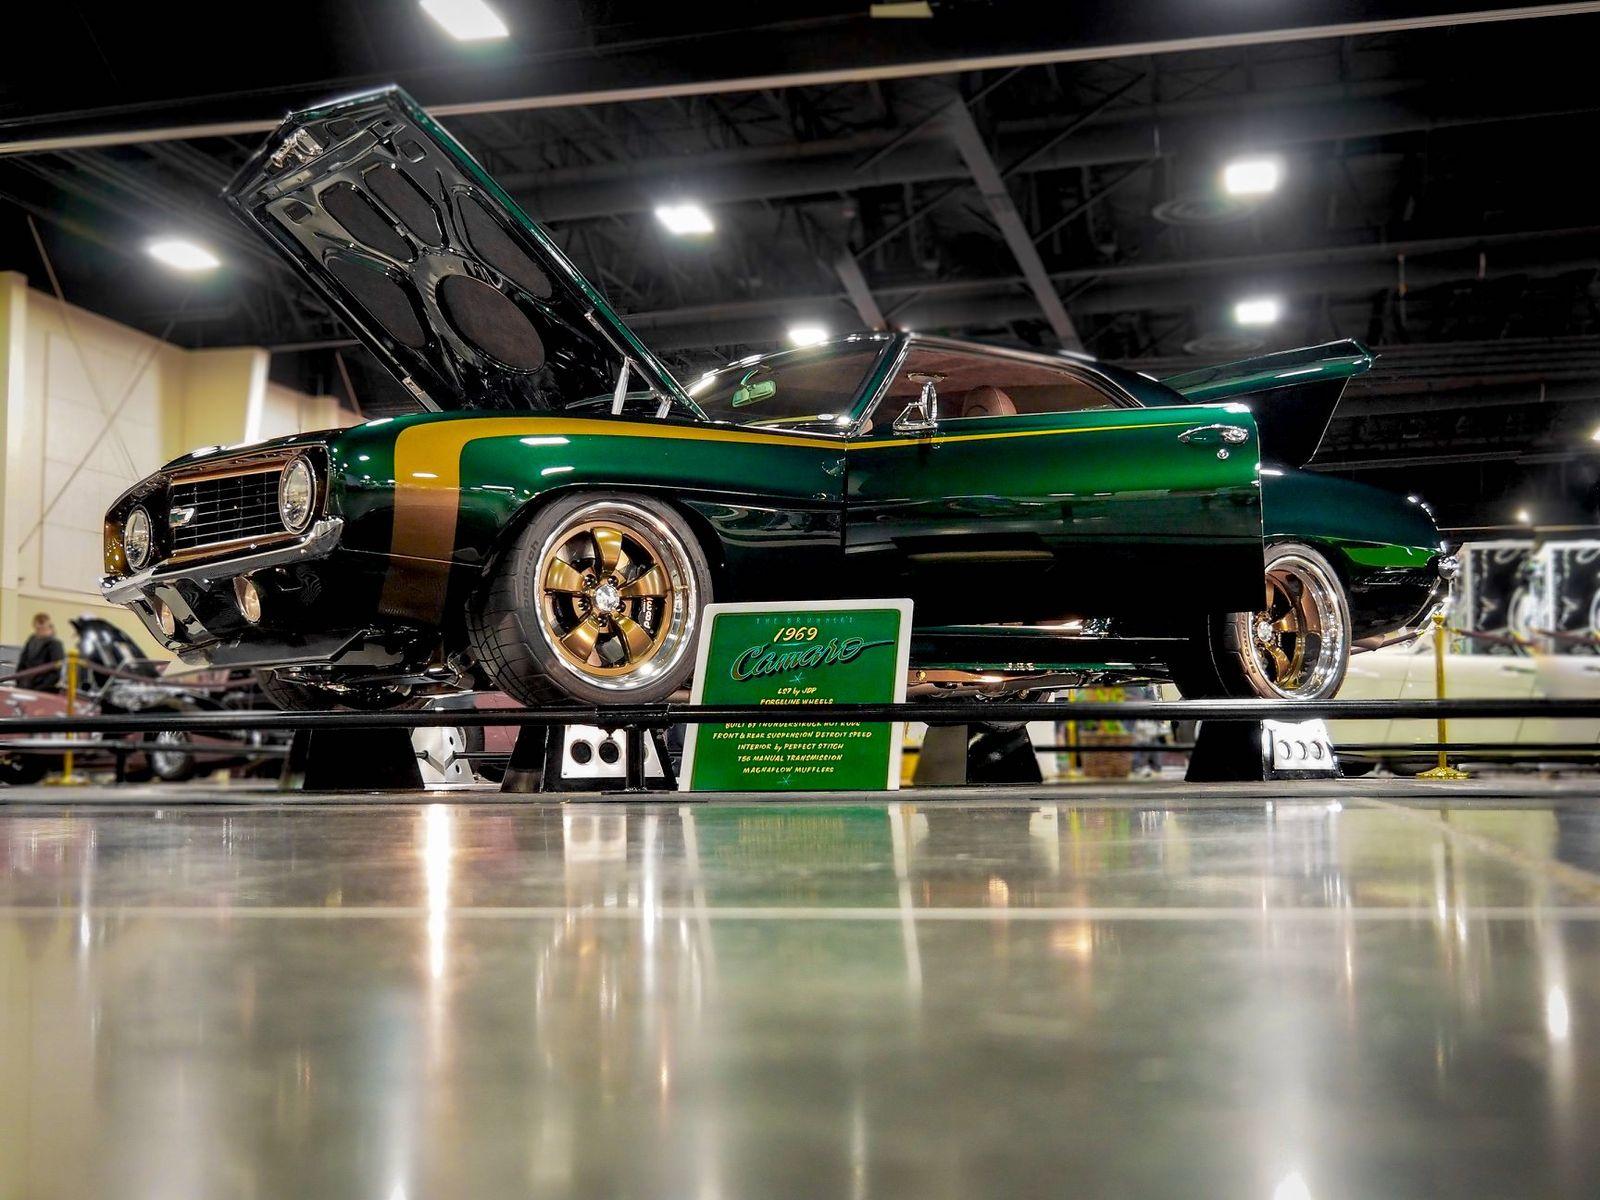 1969 Chevrolet Camaro | Thunderstruck Hot Rods '69 Camaro on Forgeline CR3 Wheels